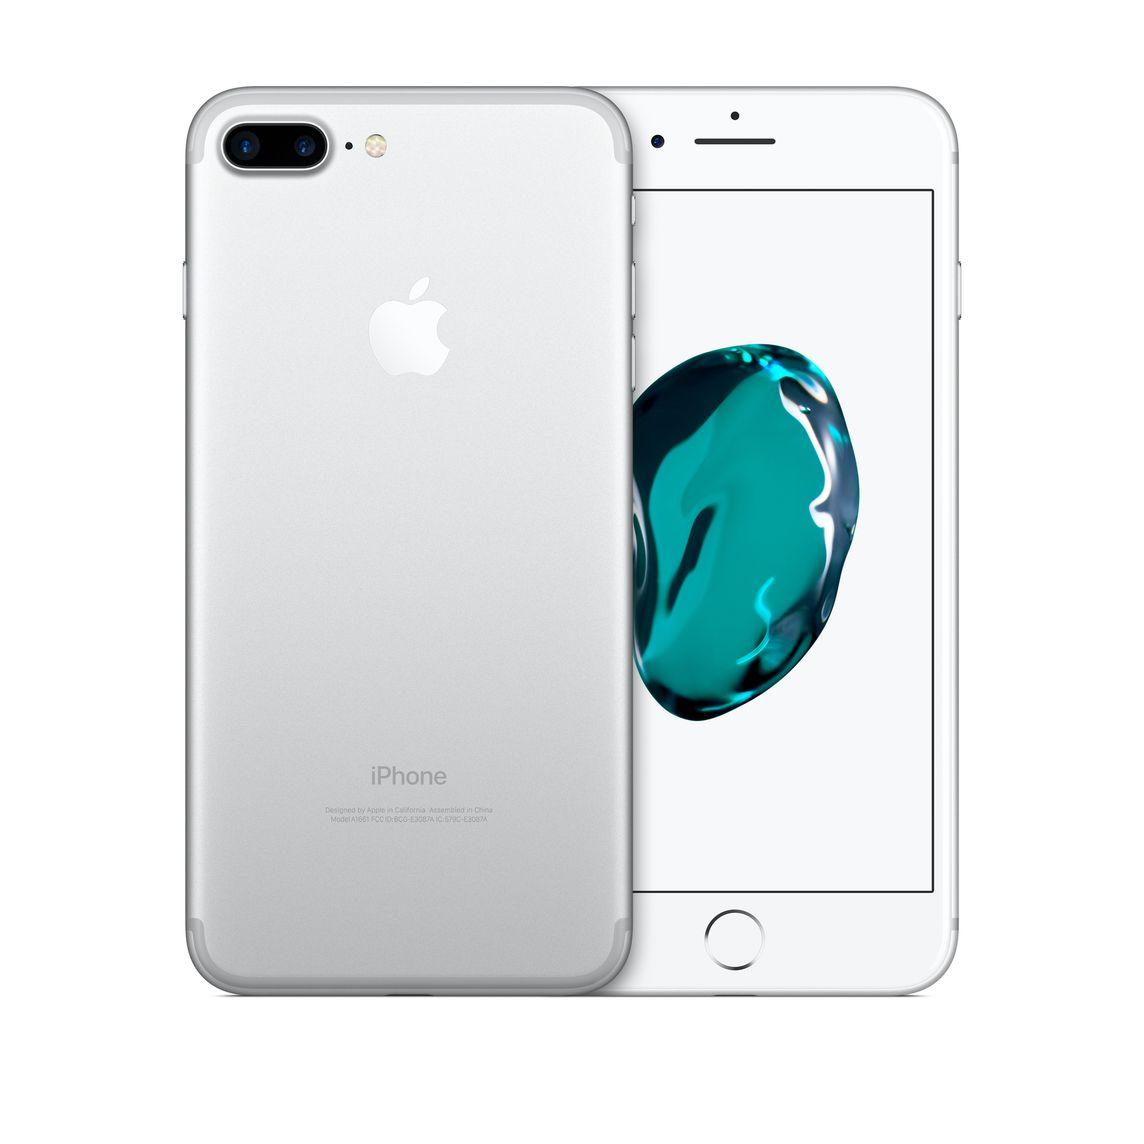 Refurbished iPhone 7 Plus 32GB - Silver (Unlocked)